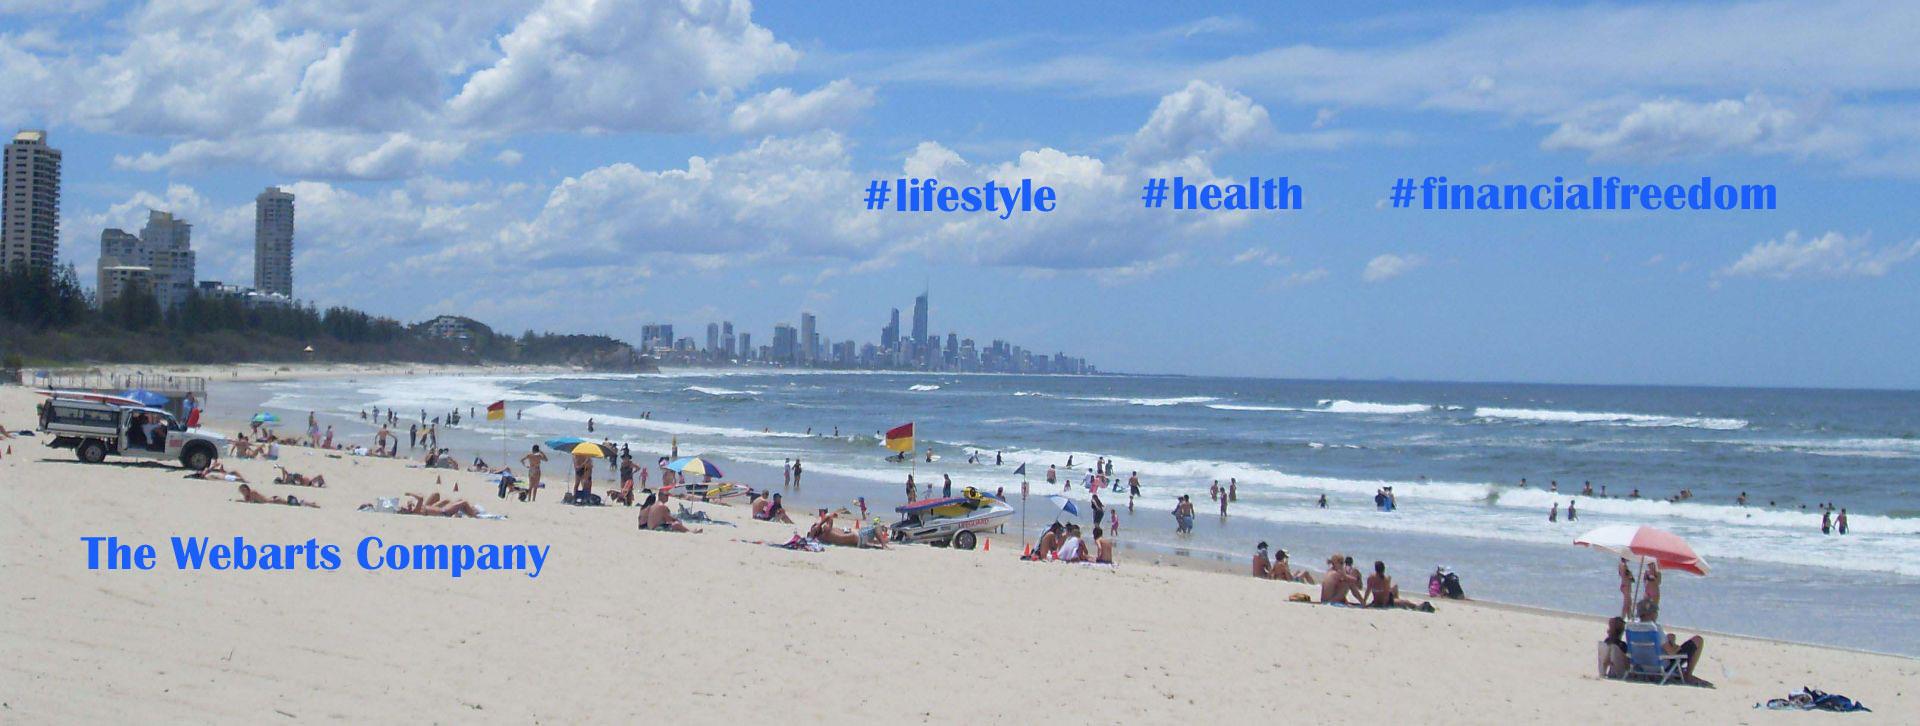 The Webarts Company Pty Ltd - #lifestyle #health #financialfreedom